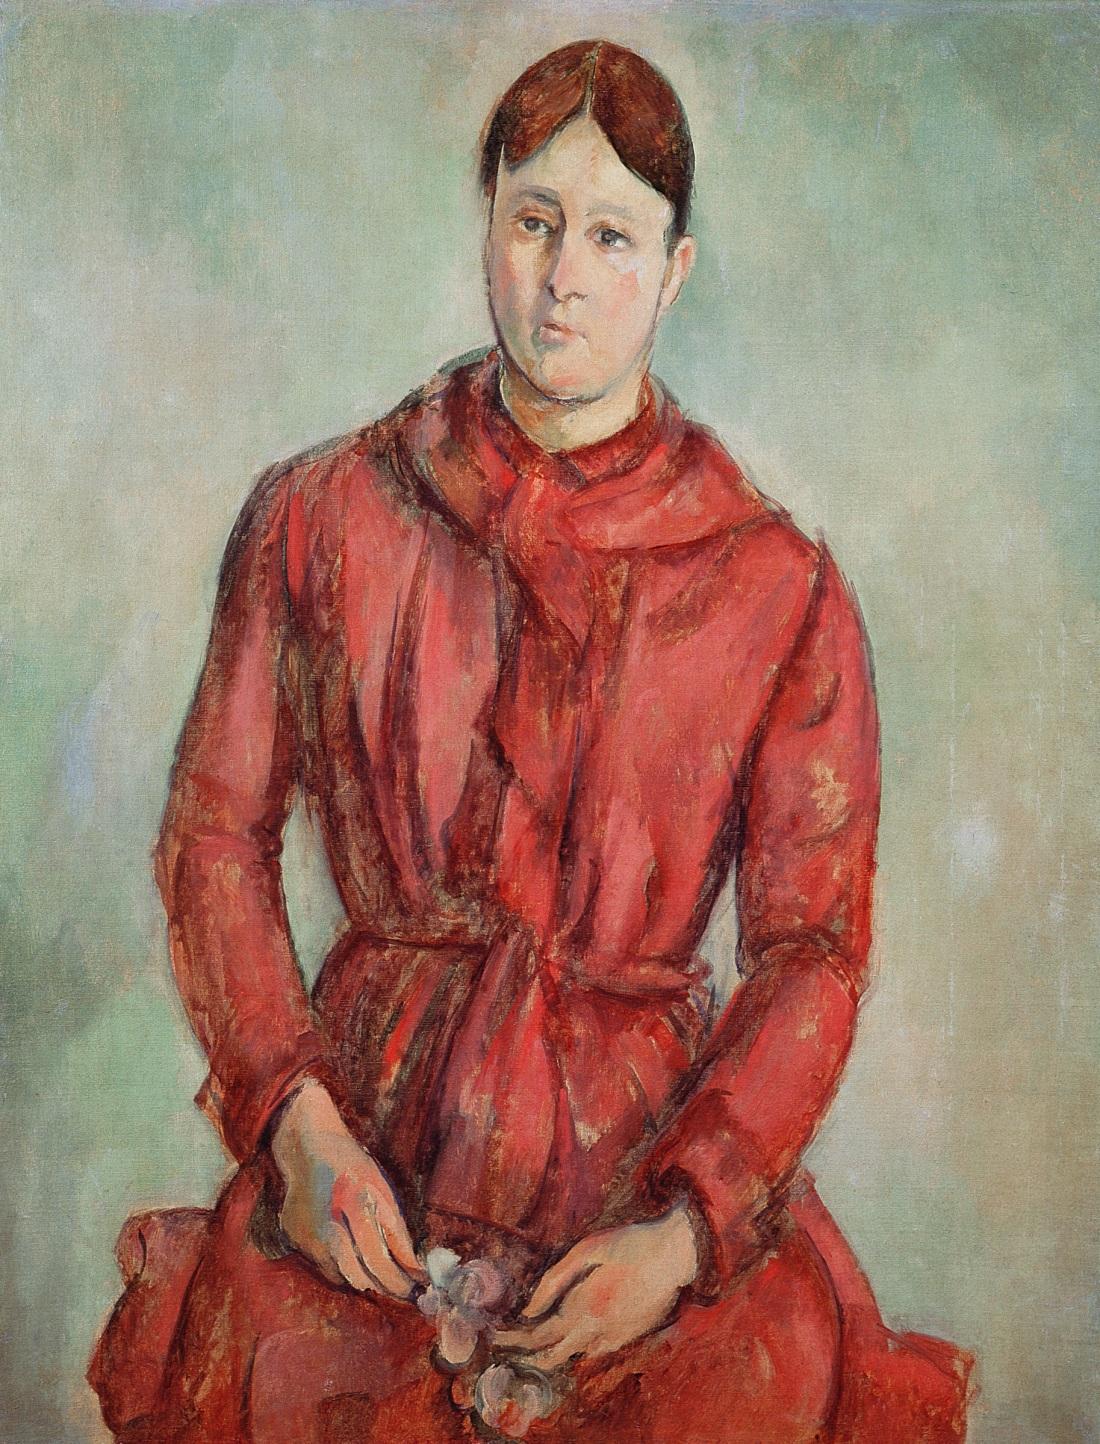 Paul Cezanne, Portrait of madame Cezanne in a Red Dress, ca. 1888-90, Collection of the Museu de Arte de Sao Paulo.